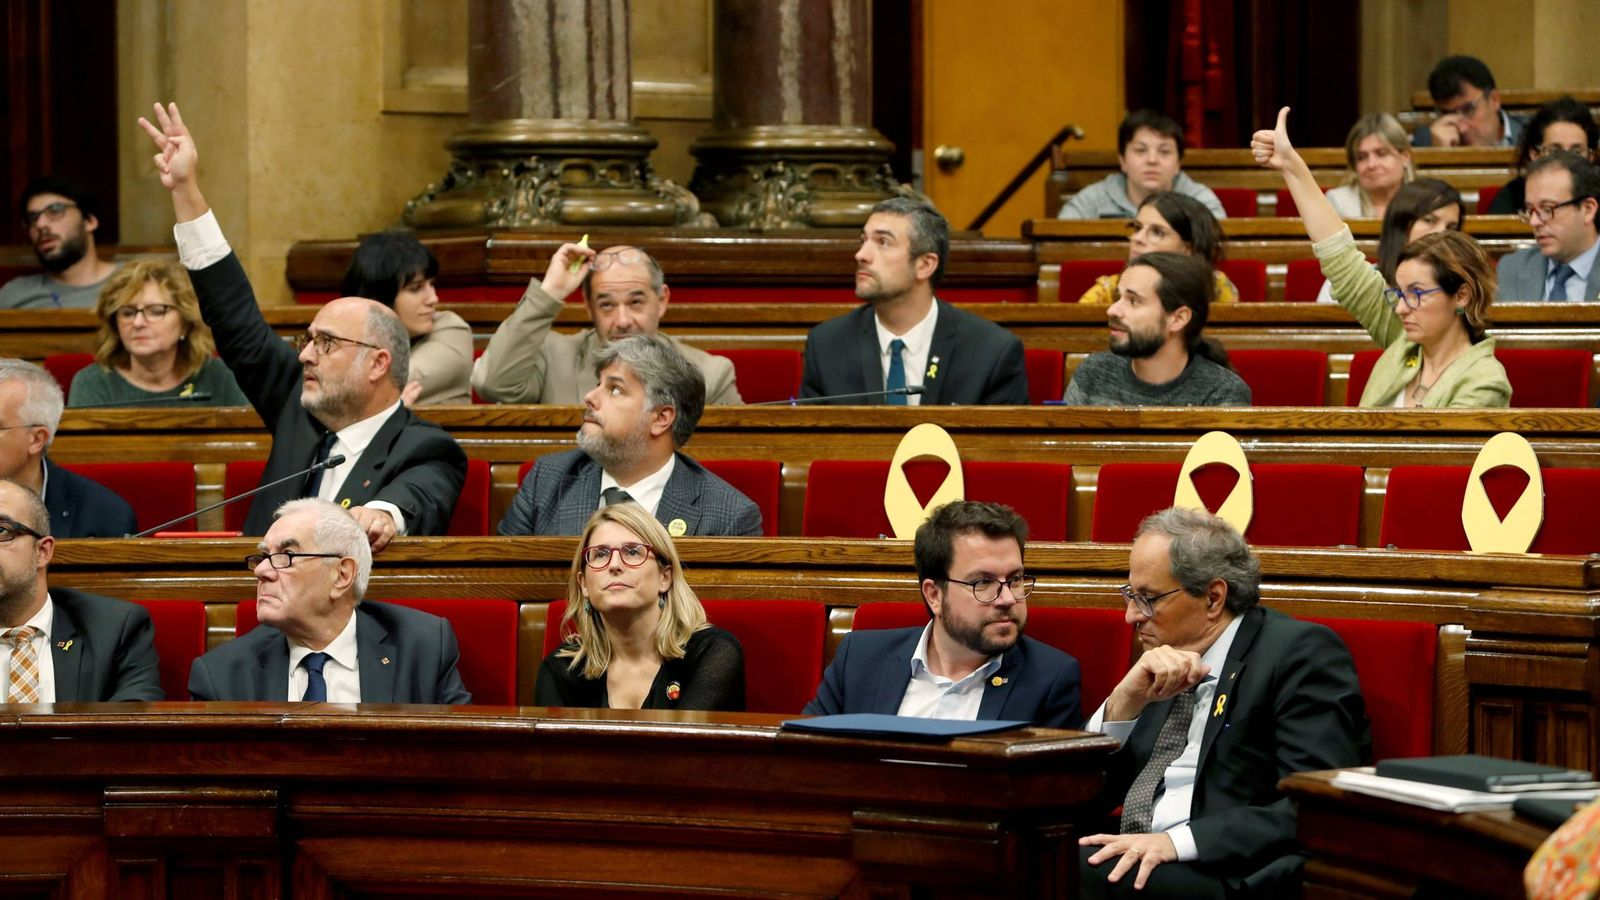 Foto: El presidente de la Generalitat Quim Torra (d) el vicepresidente, Pere Aragonès y la 'consellera' de la Presidencia, Elsa Artadi al inicio del pleno del Parlament. (EFE)